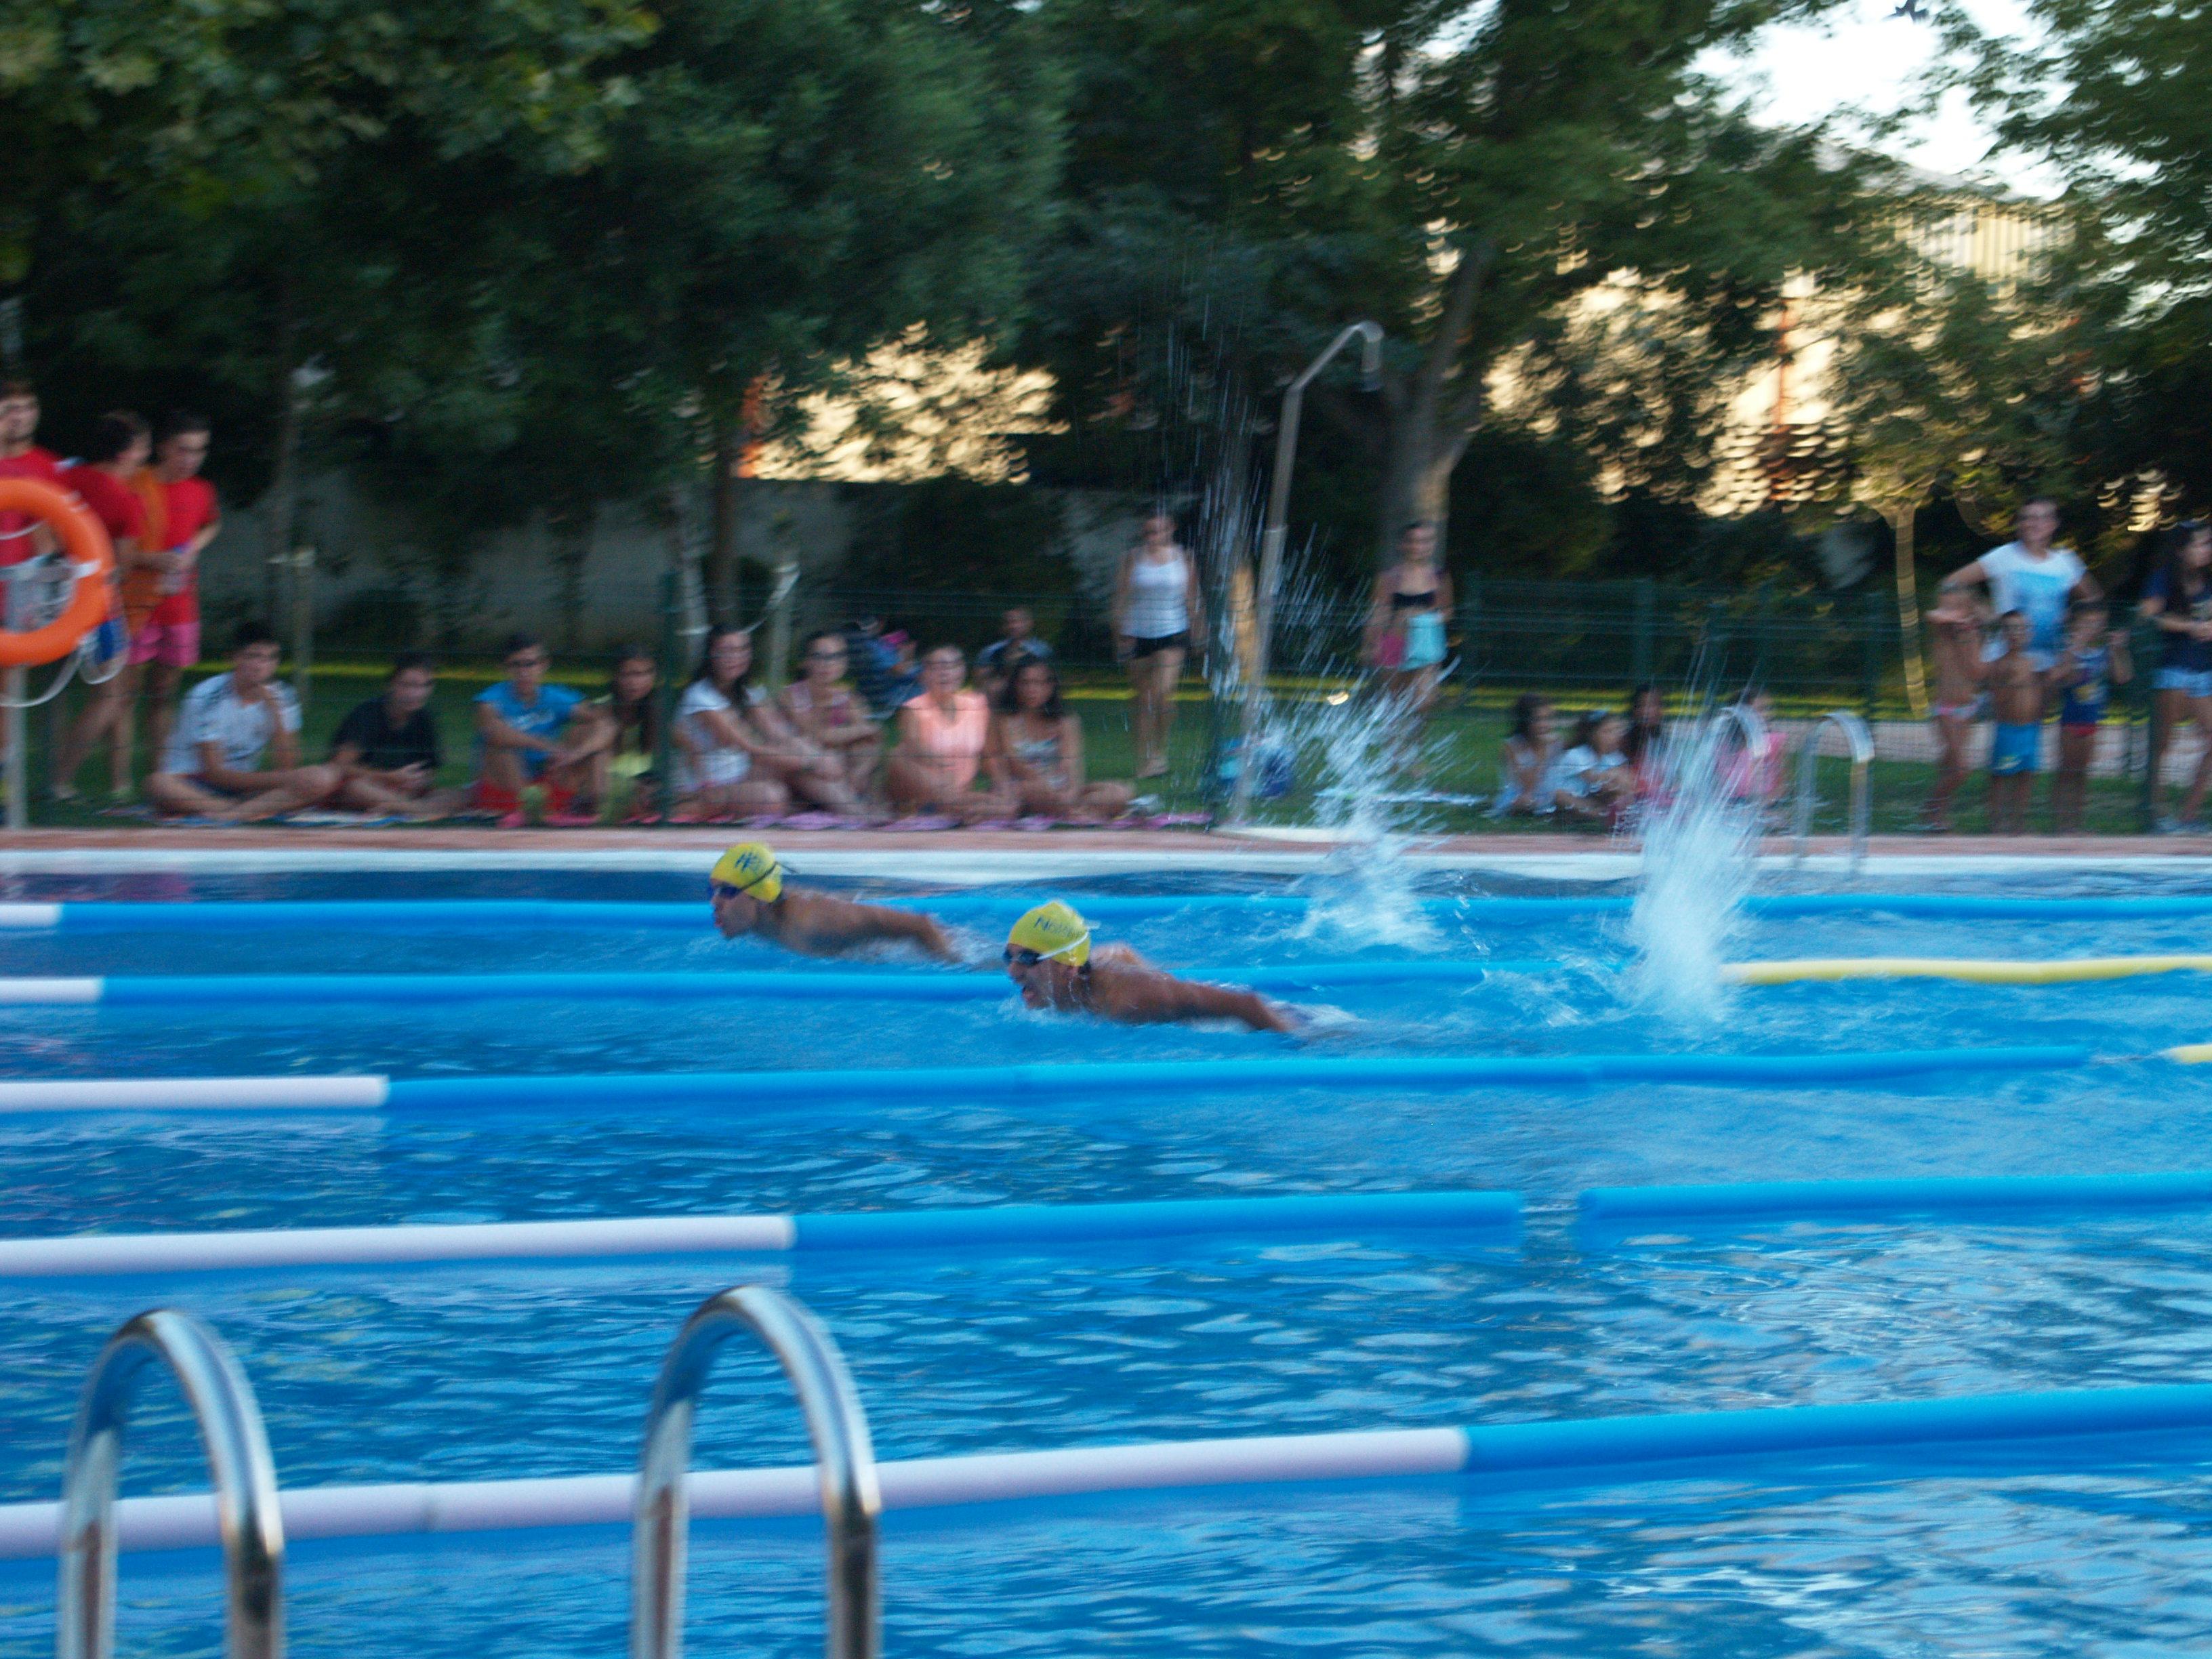 Convocadas tres plazas de socorristas para la piscina for Piscina municipal caceres